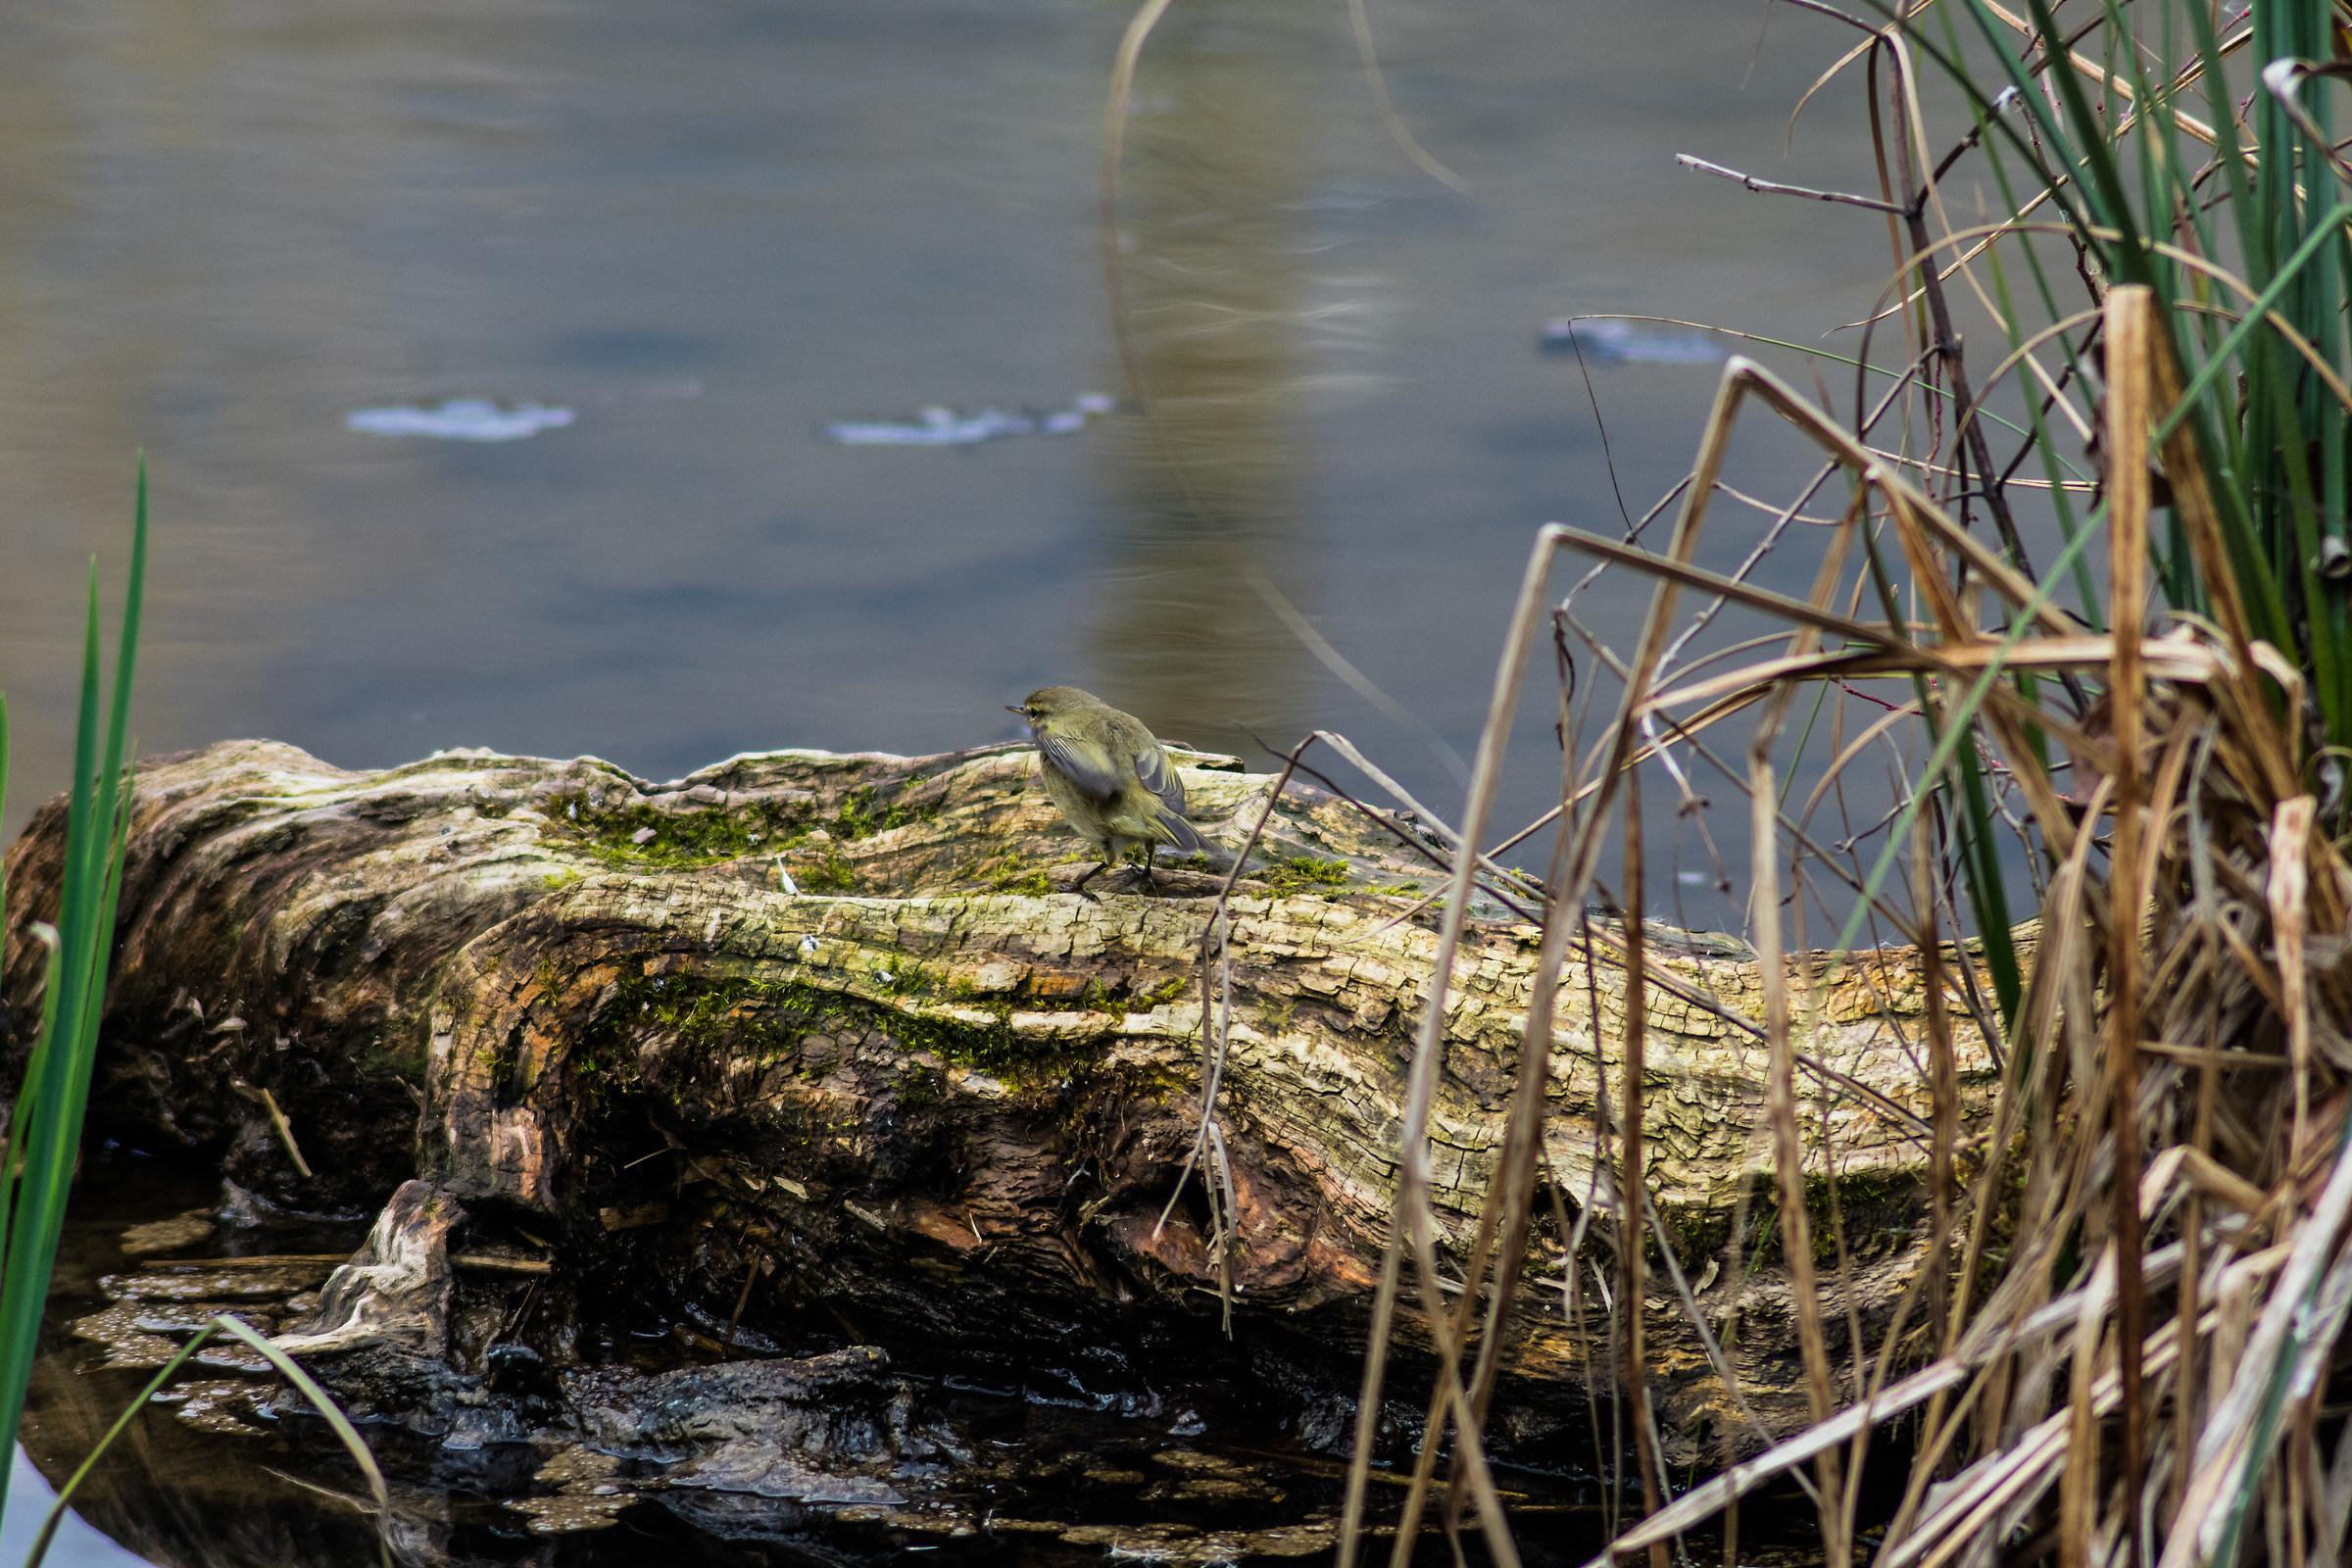 A nice inhabitant of the pond!...